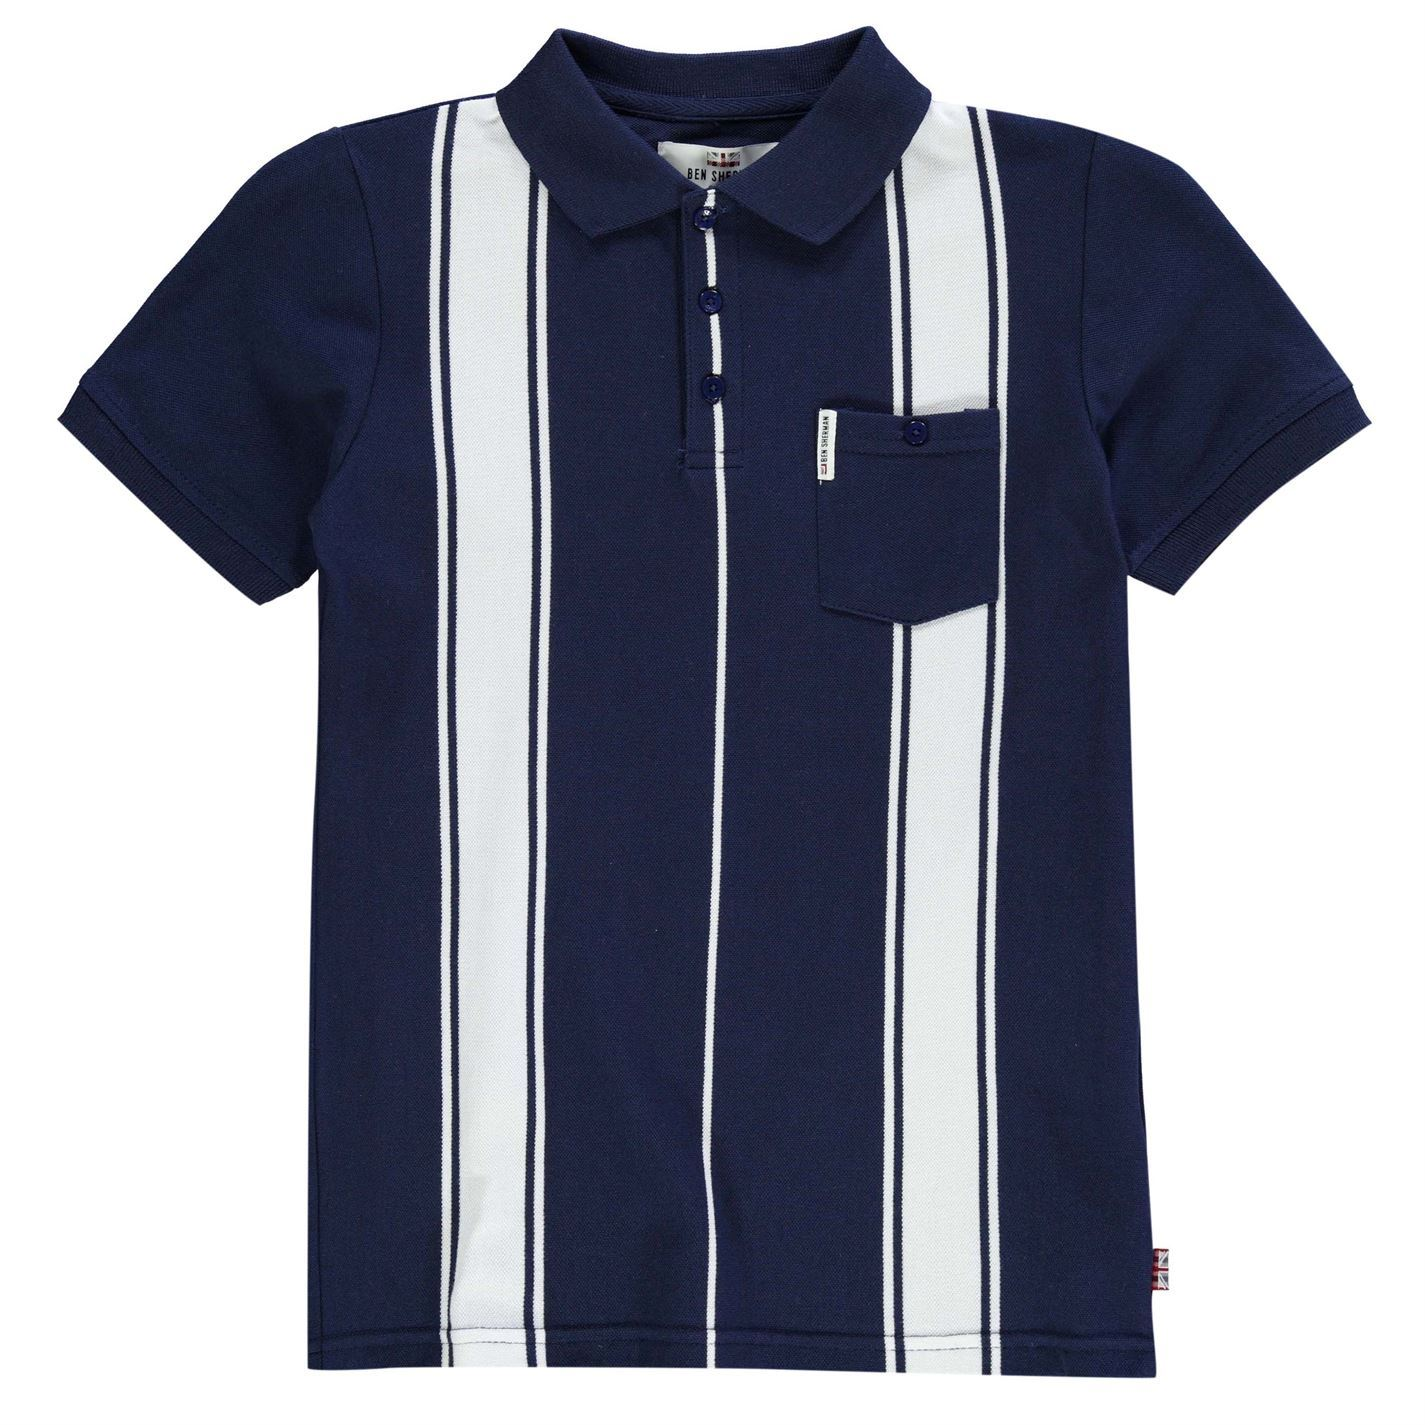 Ben Sherman Childs Vertical Stripe Polo Tee Shirt Top Boys Button Pocket Cotton